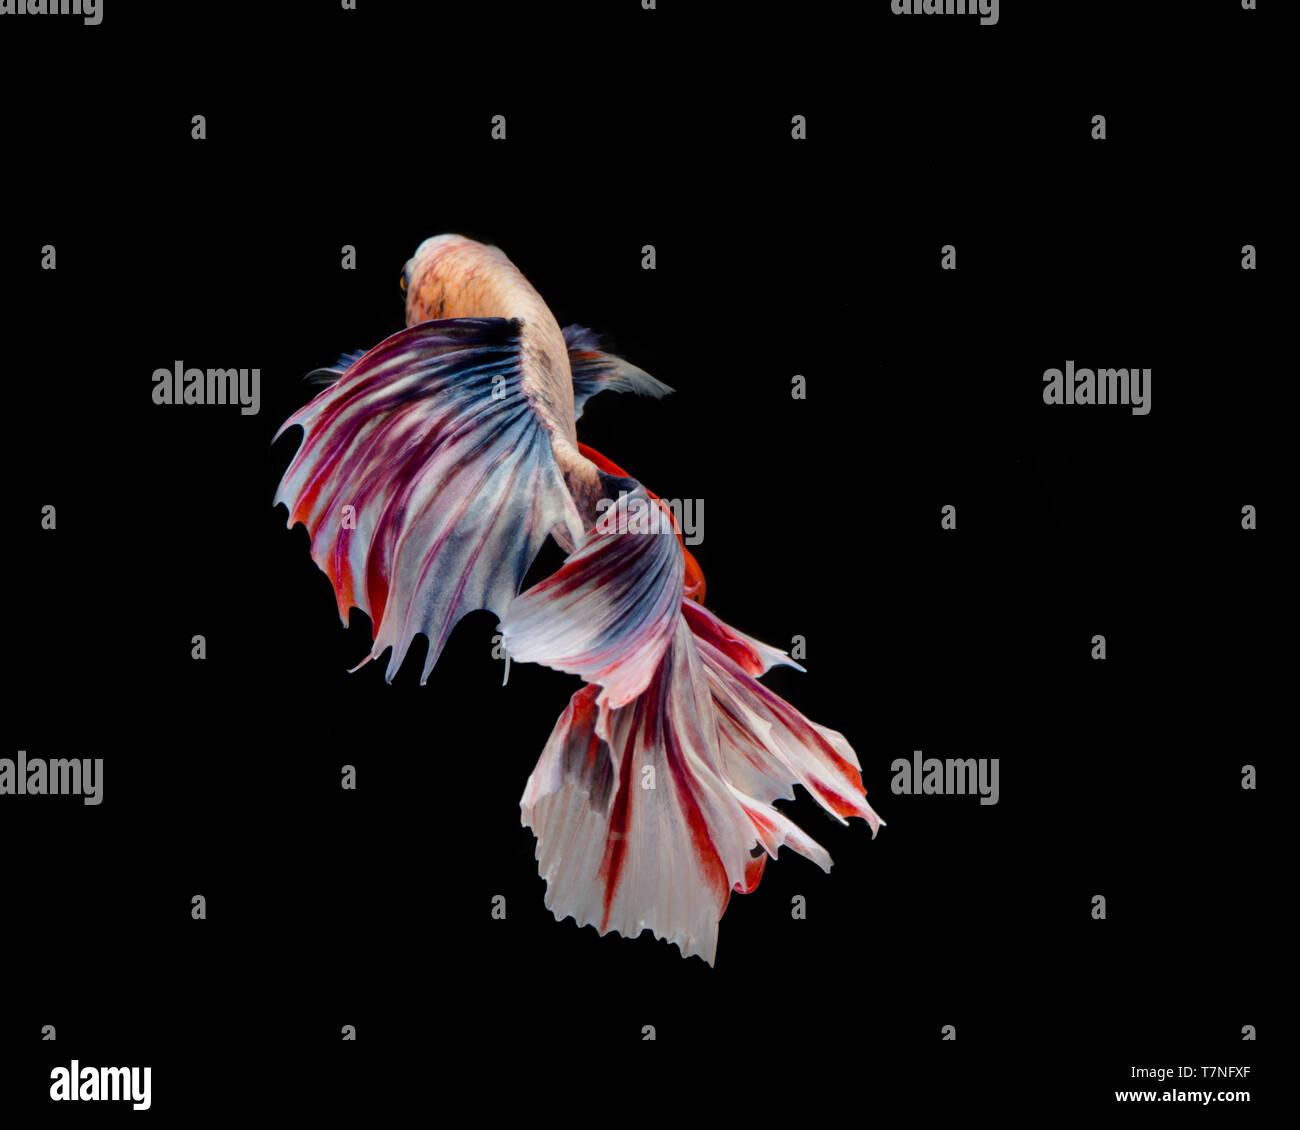 Multi-color betta fish, siamese fighting fish on black background - Stock Image